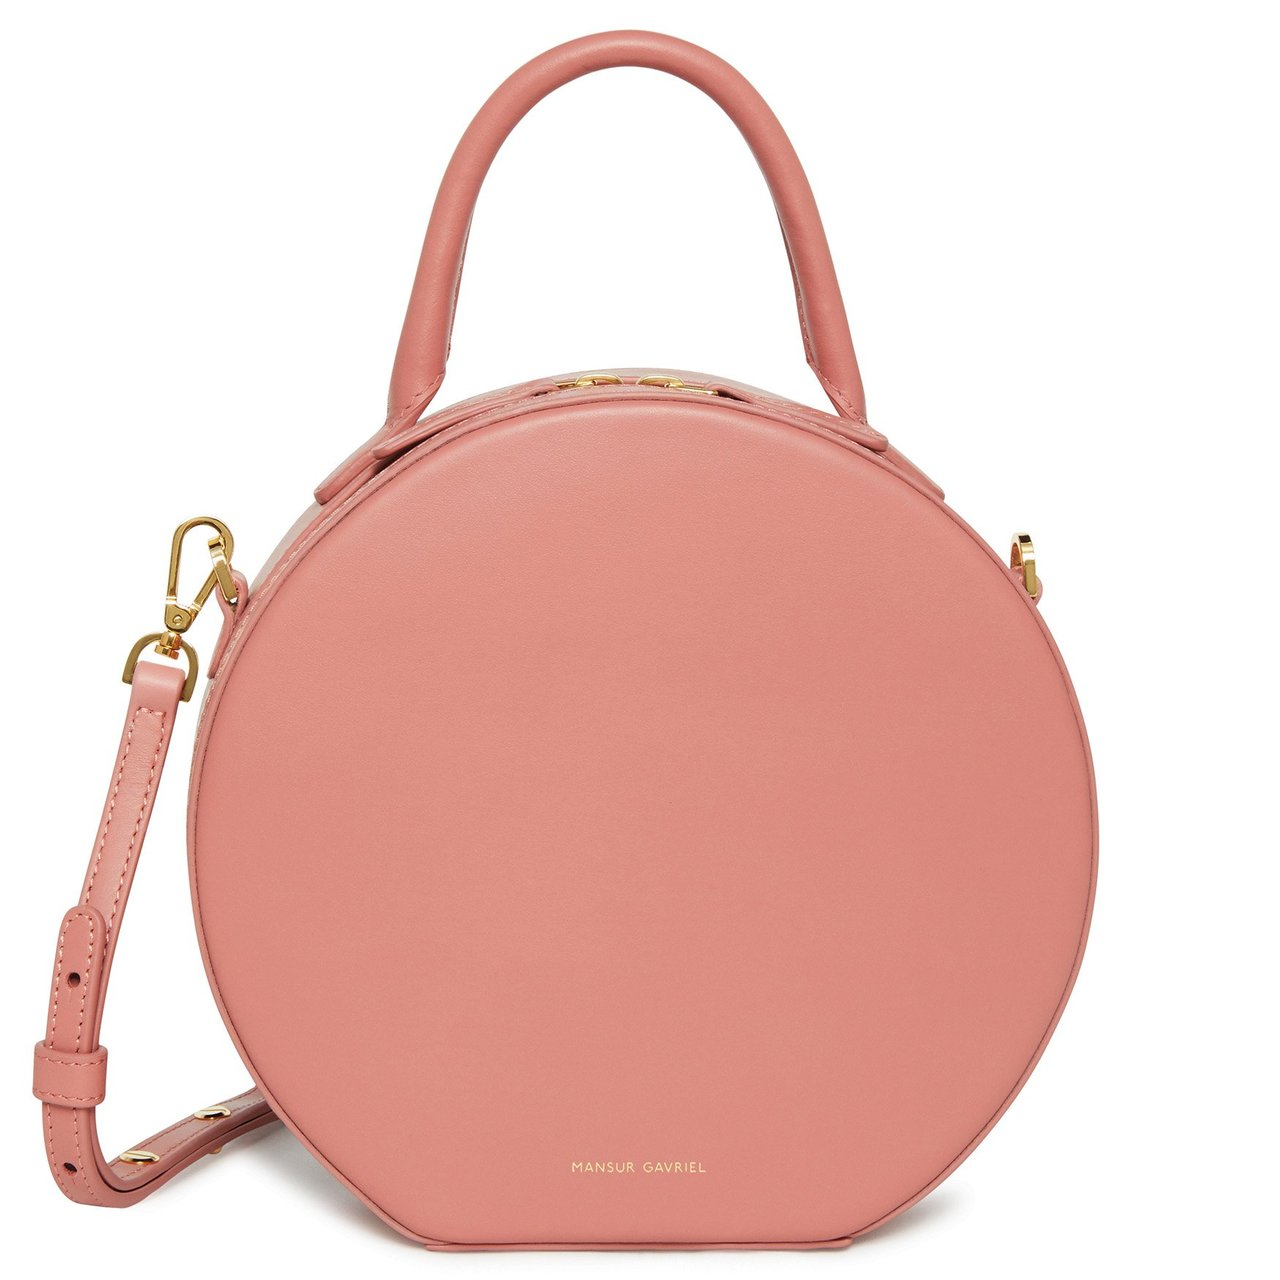 Mansur Gavriel Circle Crossbody Bag | Best Round Bags for Spring 2019 | CoffeeAndHandbags.com